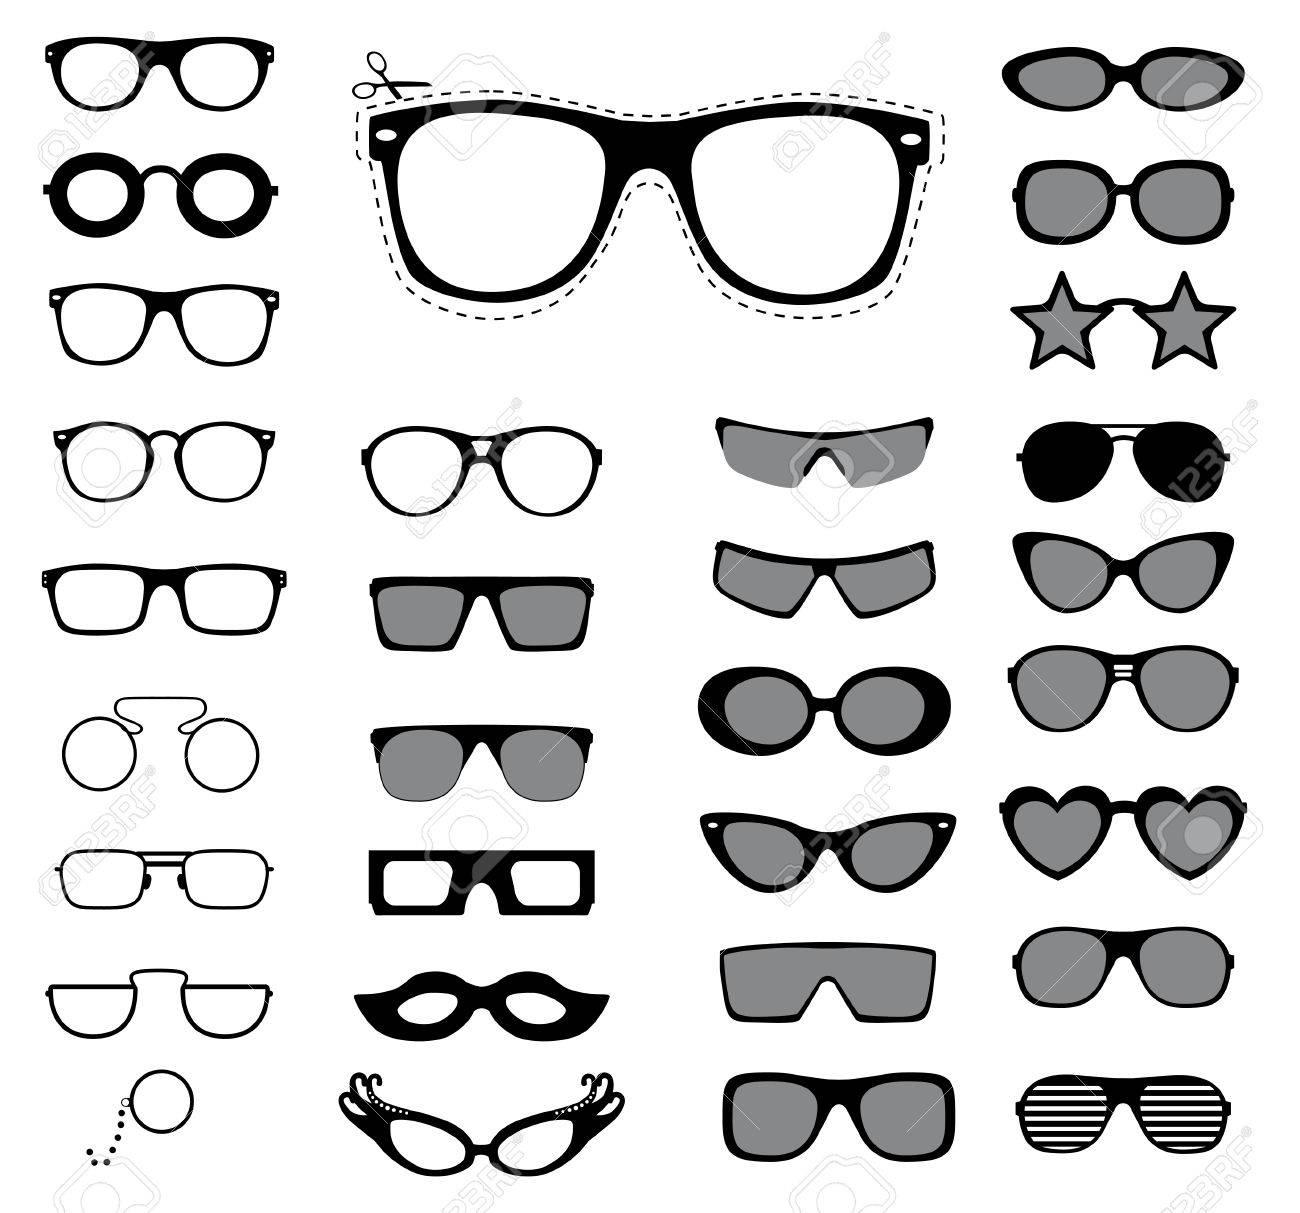 Set of sunglasses and glasses illustration - 31024393